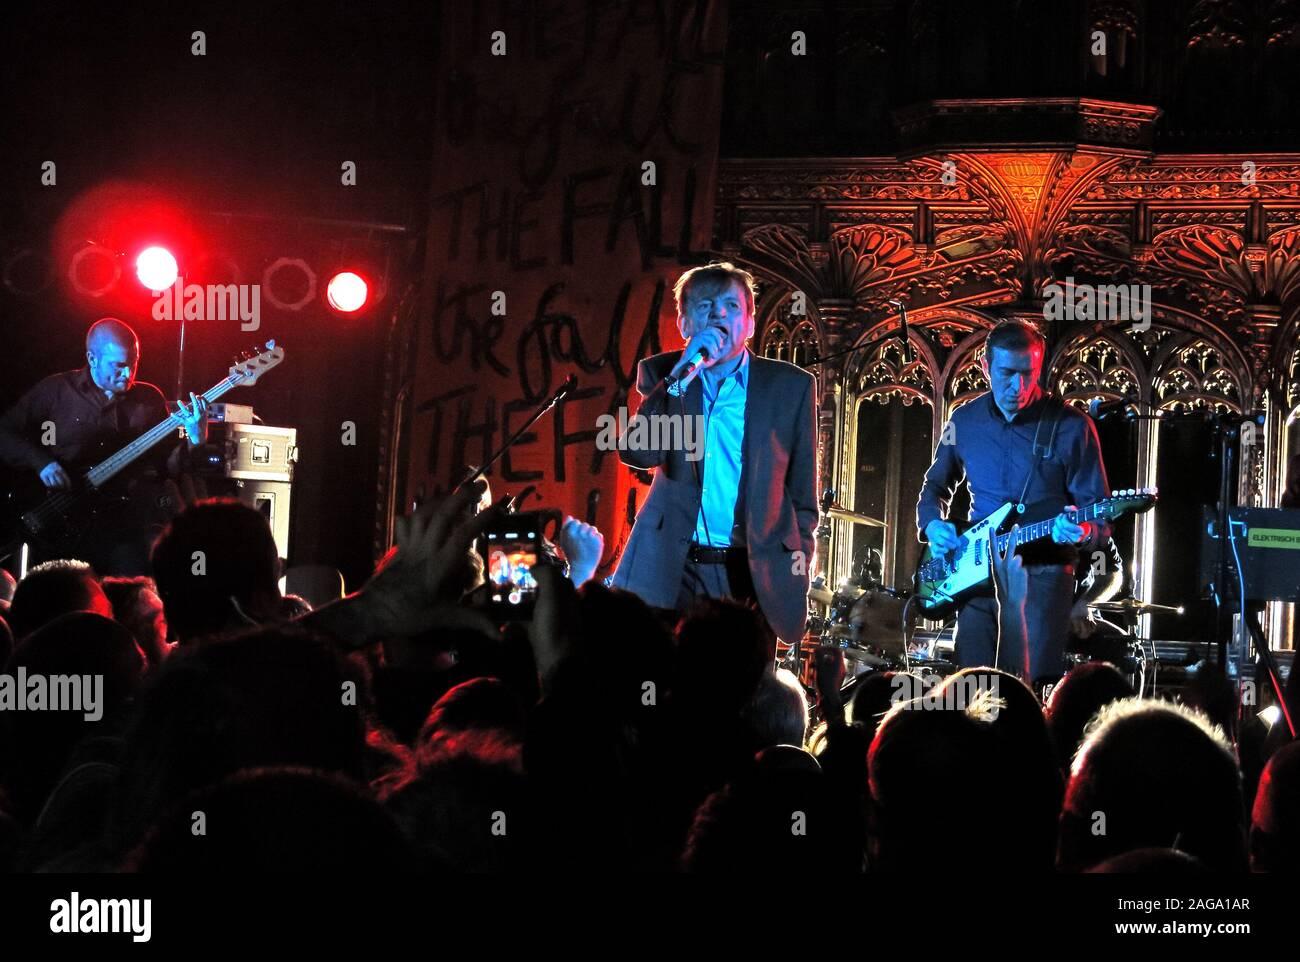 Manchester Cathedral,HotpixUK,@HotpixUK,GoTonySmith,gig,live,tour,2014,on stage,Daren Garratt,Dave Spurr,bass,Elena Poulou,Pete Greenway,guitar,TheFallMancCath15-05-2014,Simon Archer,Mark E Smith and The Fall perform live,Mark E Smith and The Fall,perform,performing